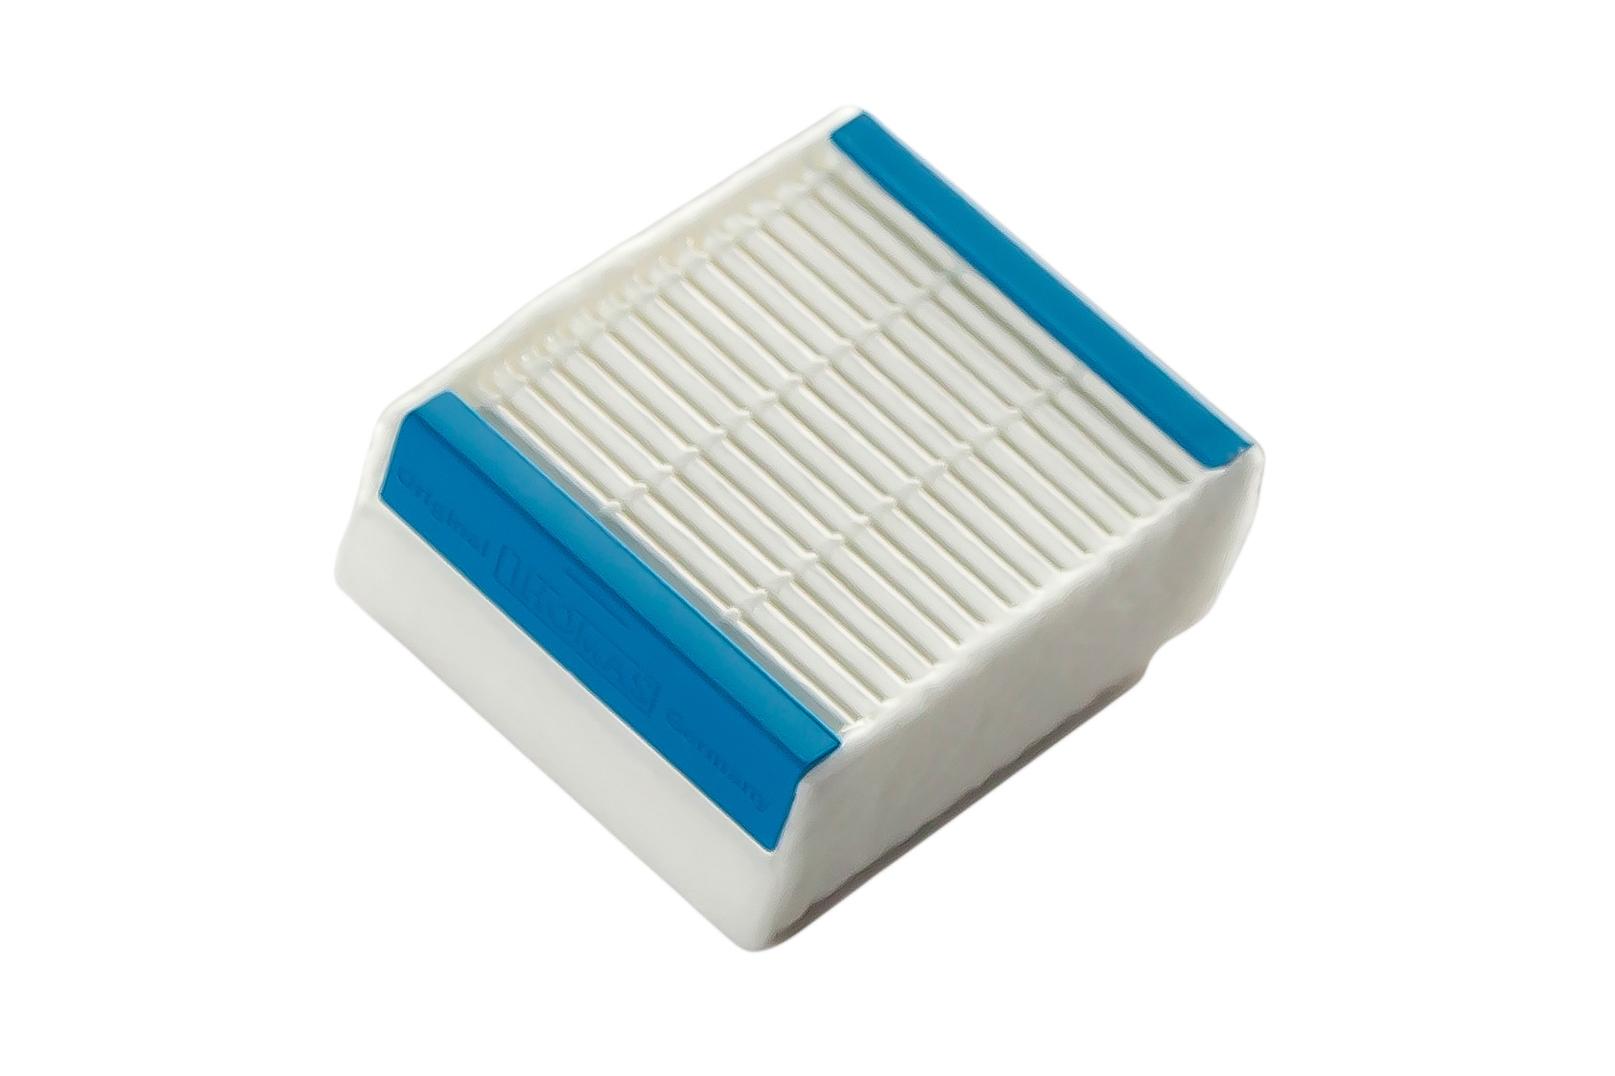 Пылесос Thomas Aqua-Box Compact [786533]